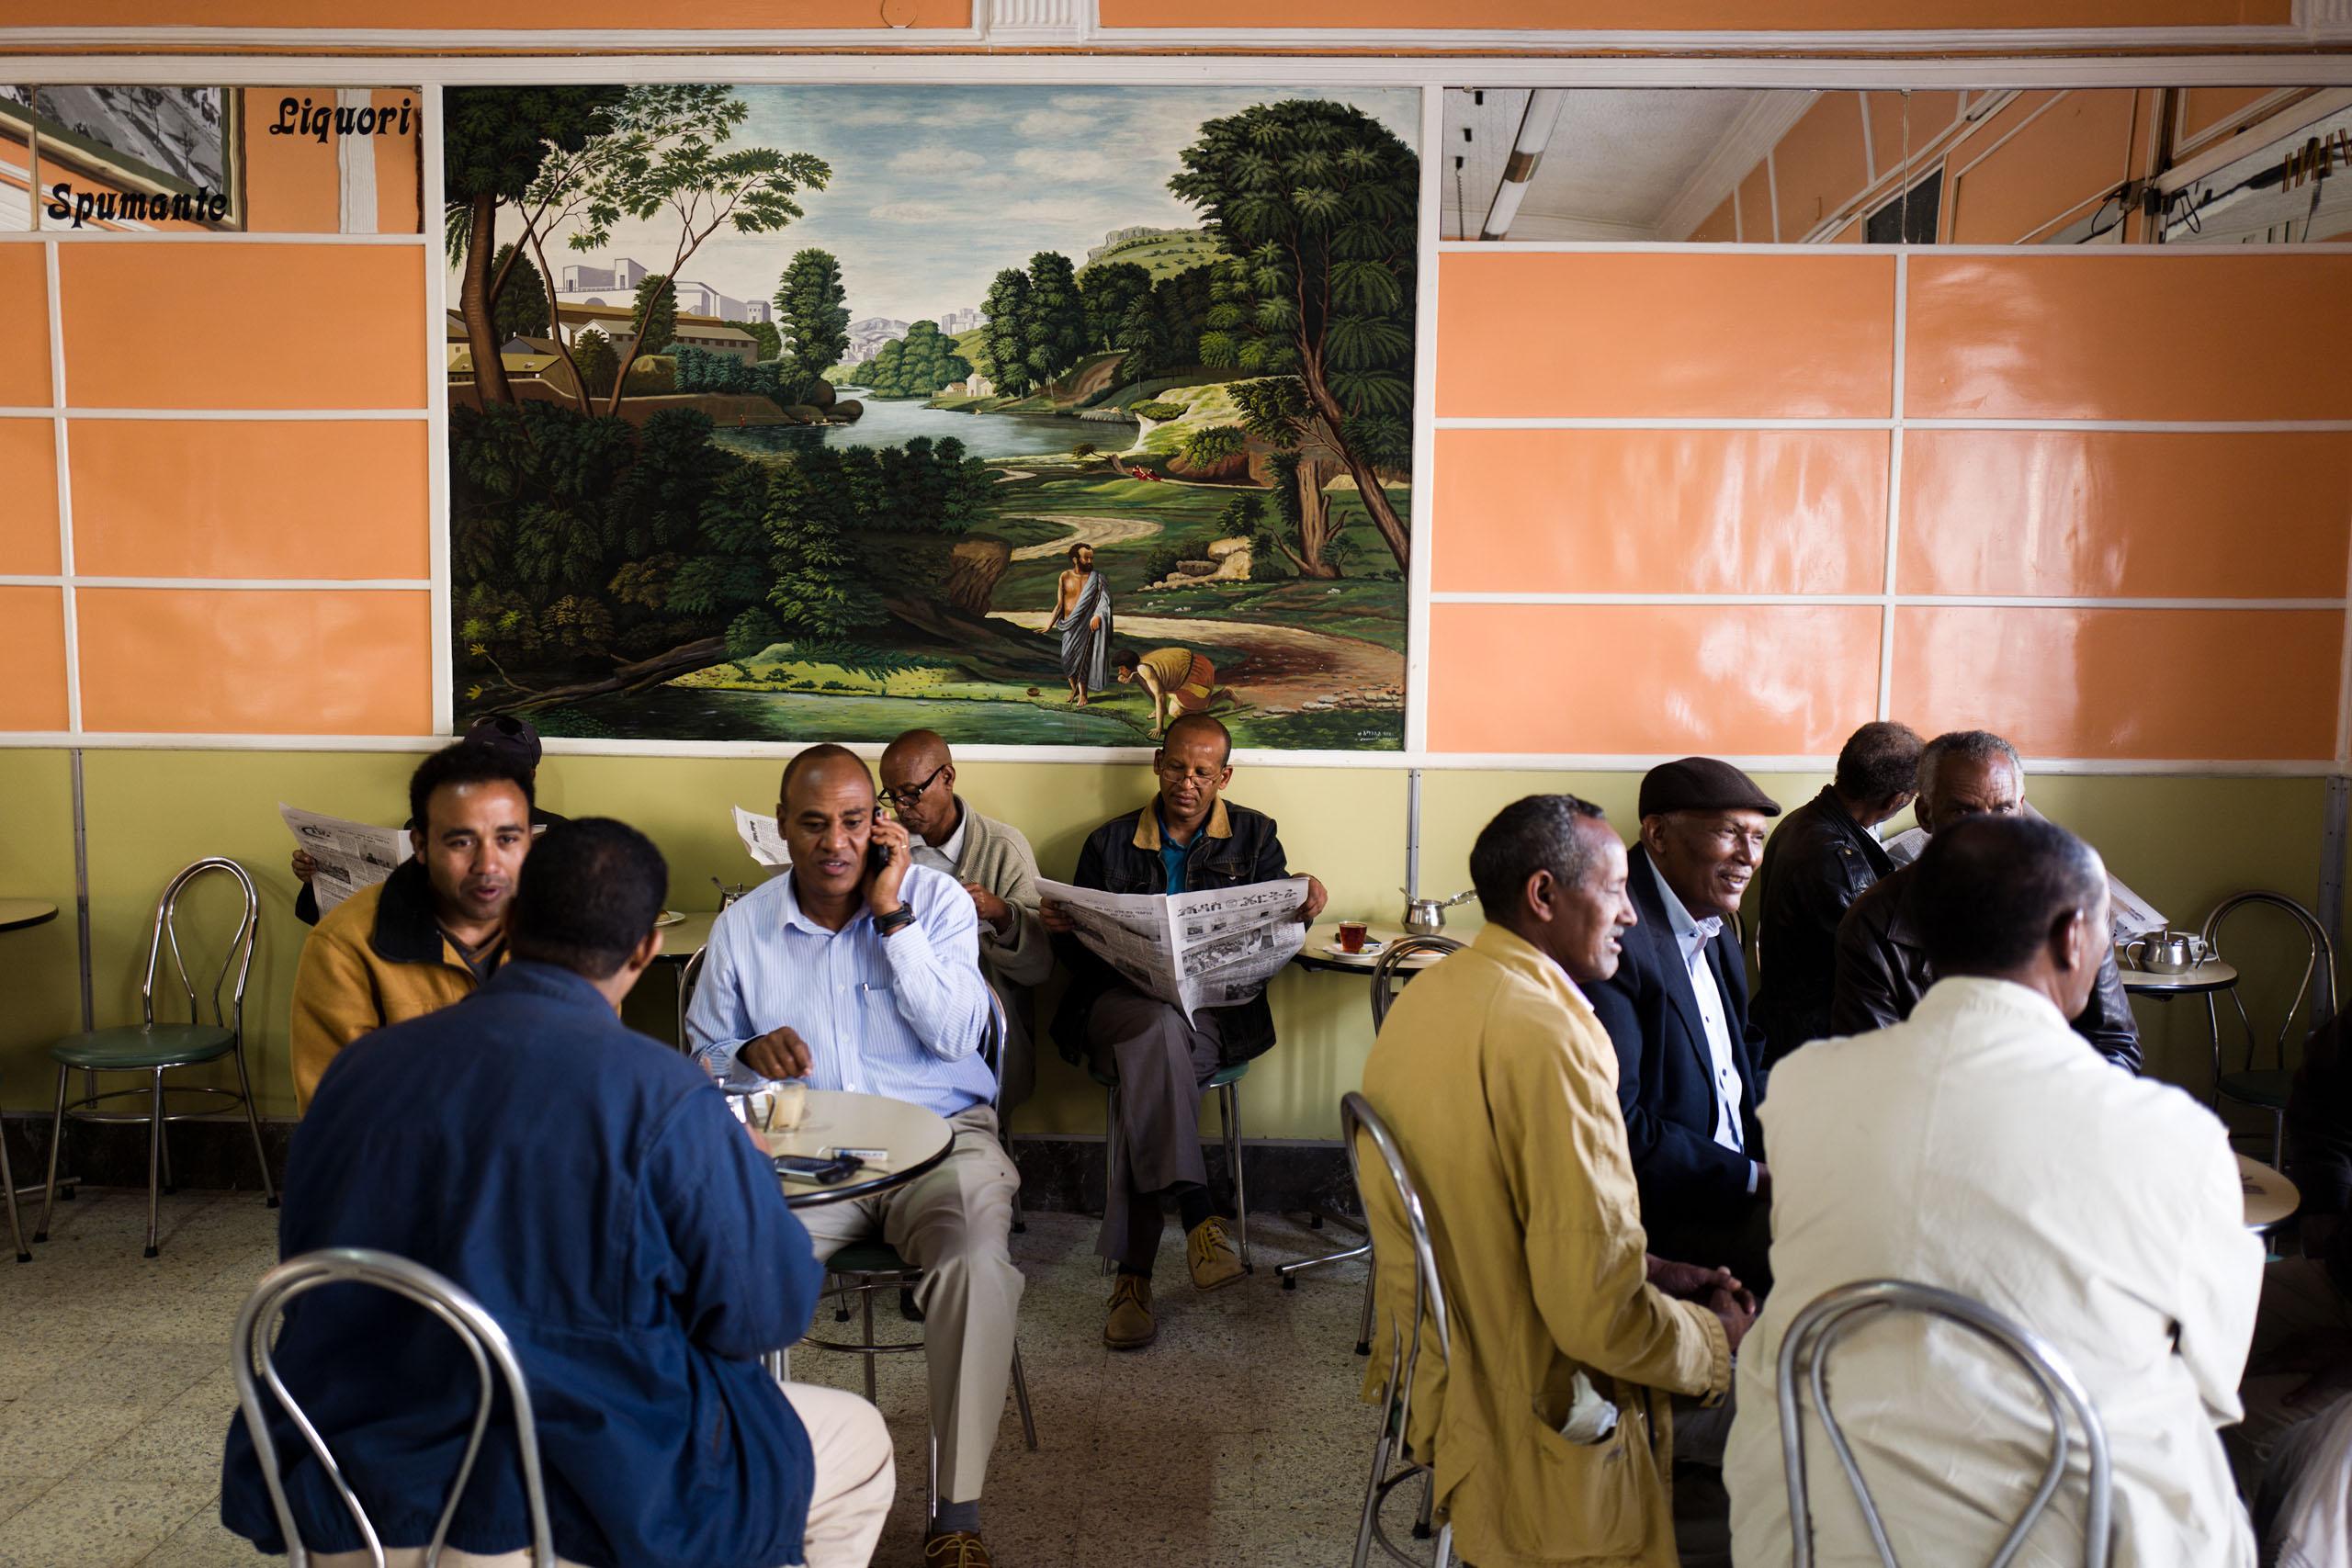 Bar Vittoria in  Asmara, with original design from the 1950's.